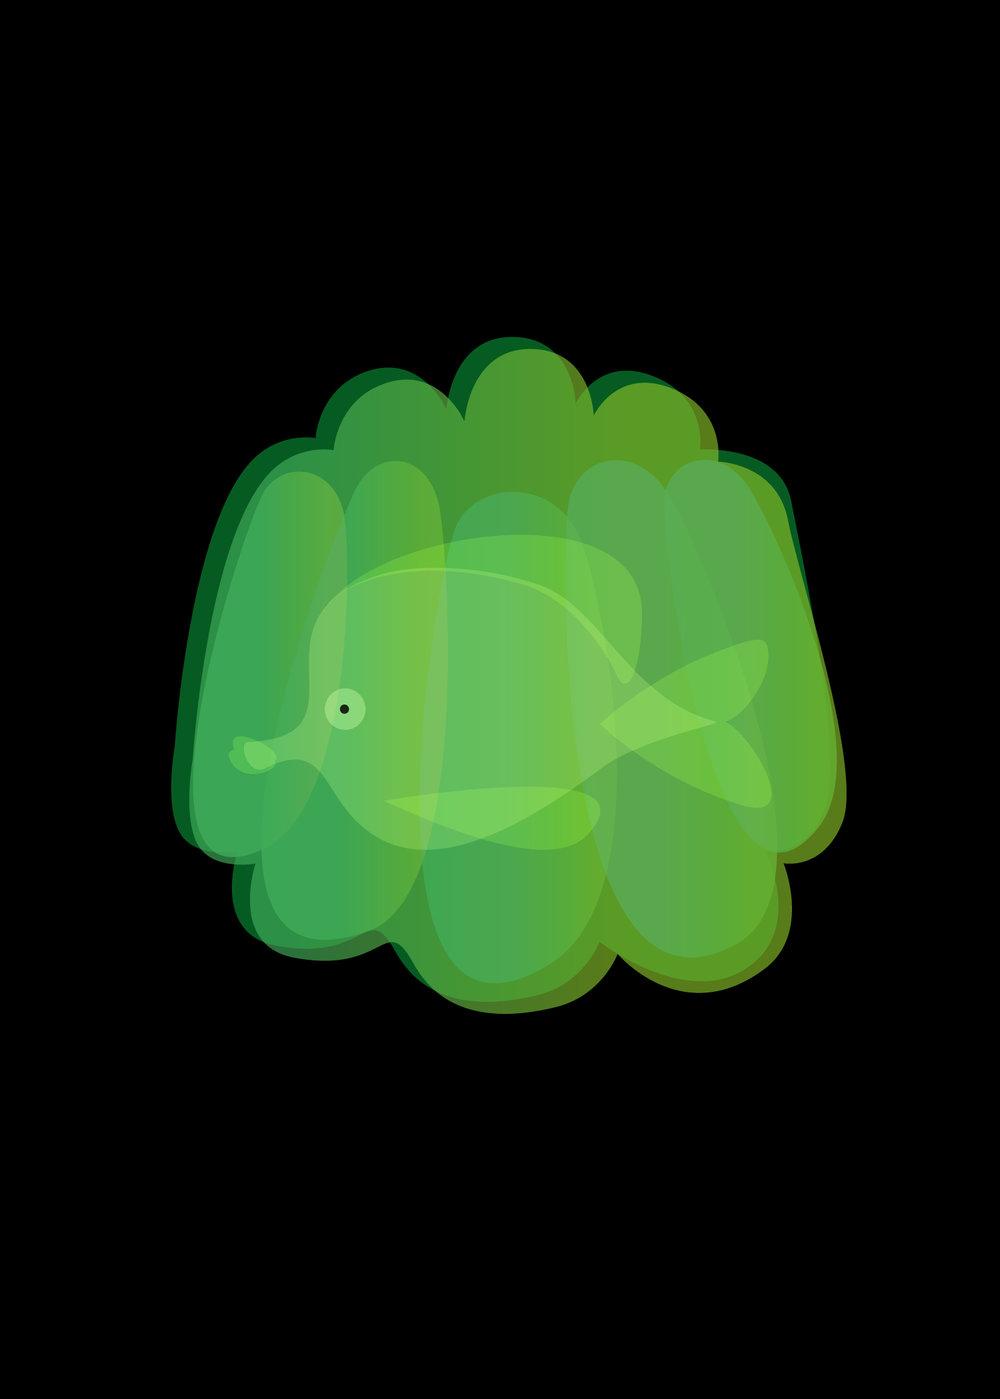 Jelly2.jpg